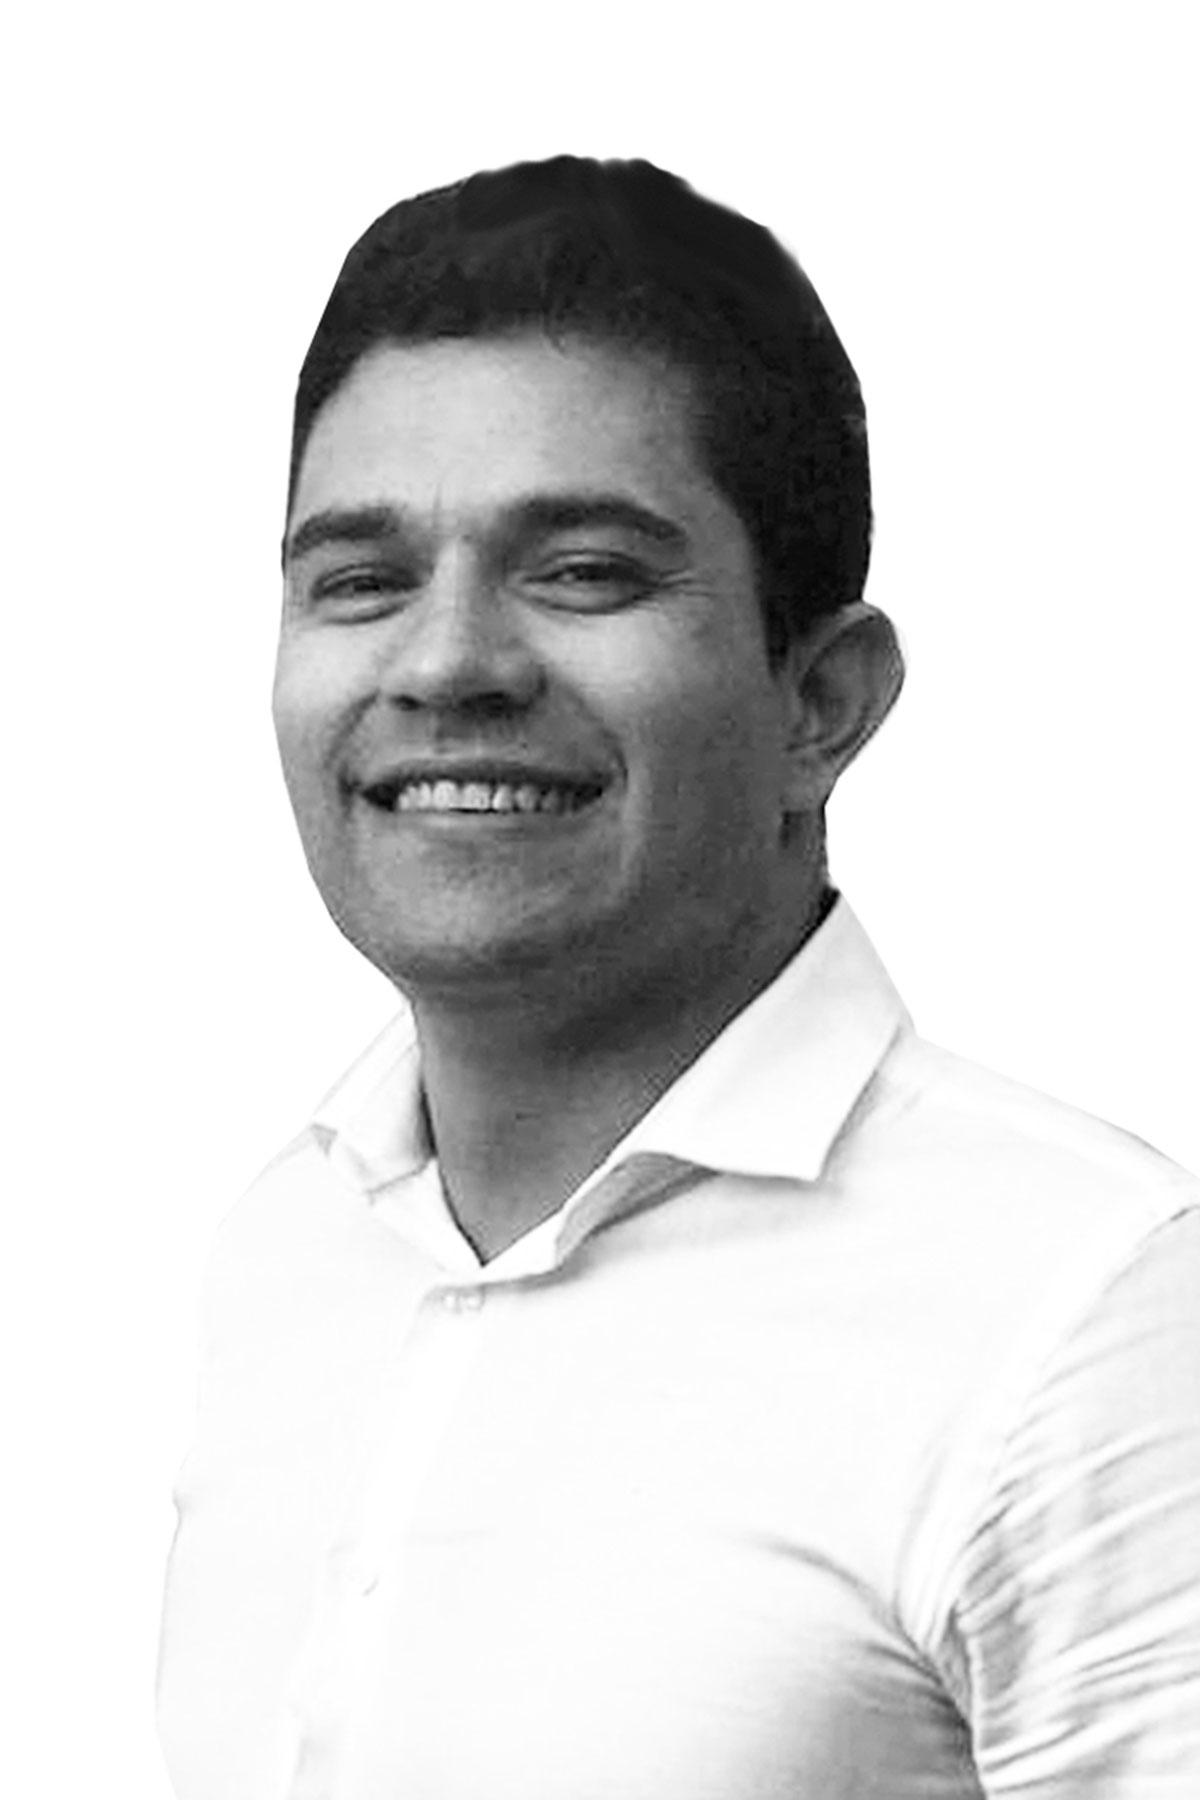 Emmanuel Betancourt